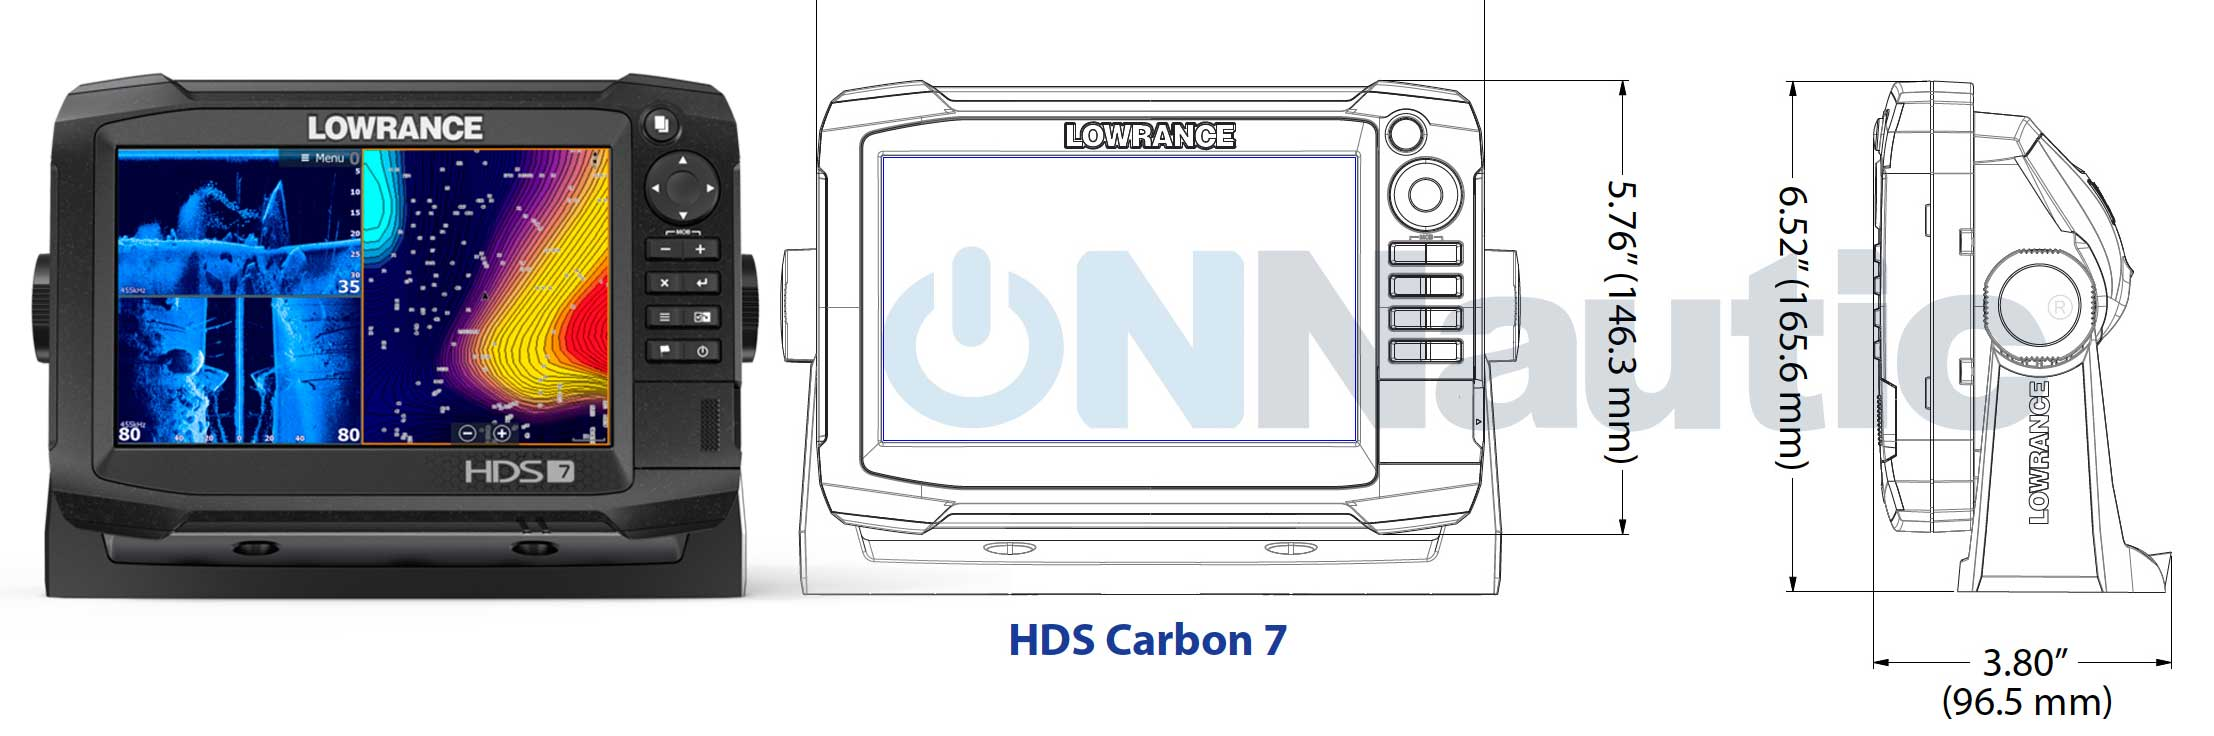 Lowrance HDS7 Carbon